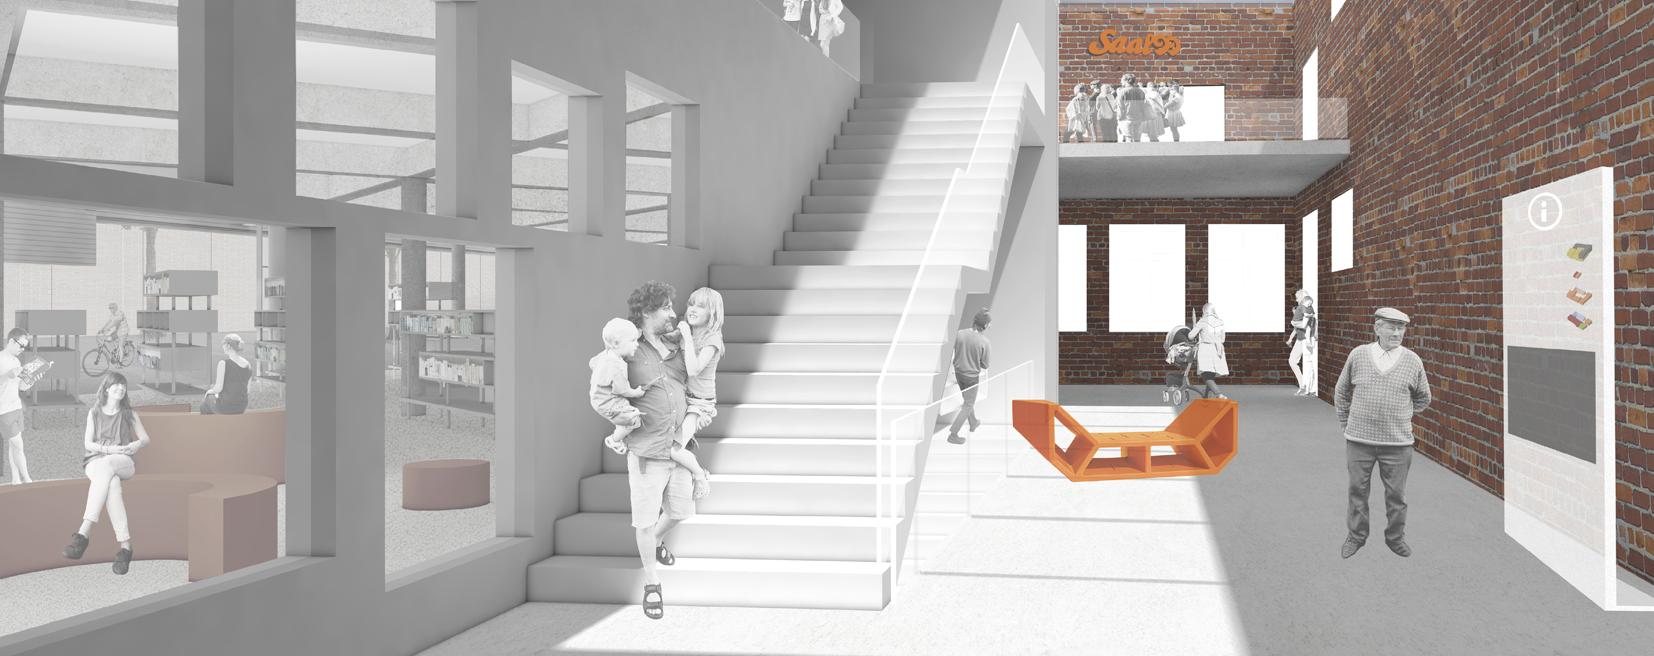 bezirksamt eimsb ttel b rgerhaus eidelstedt fhh. Black Bedroom Furniture Sets. Home Design Ideas